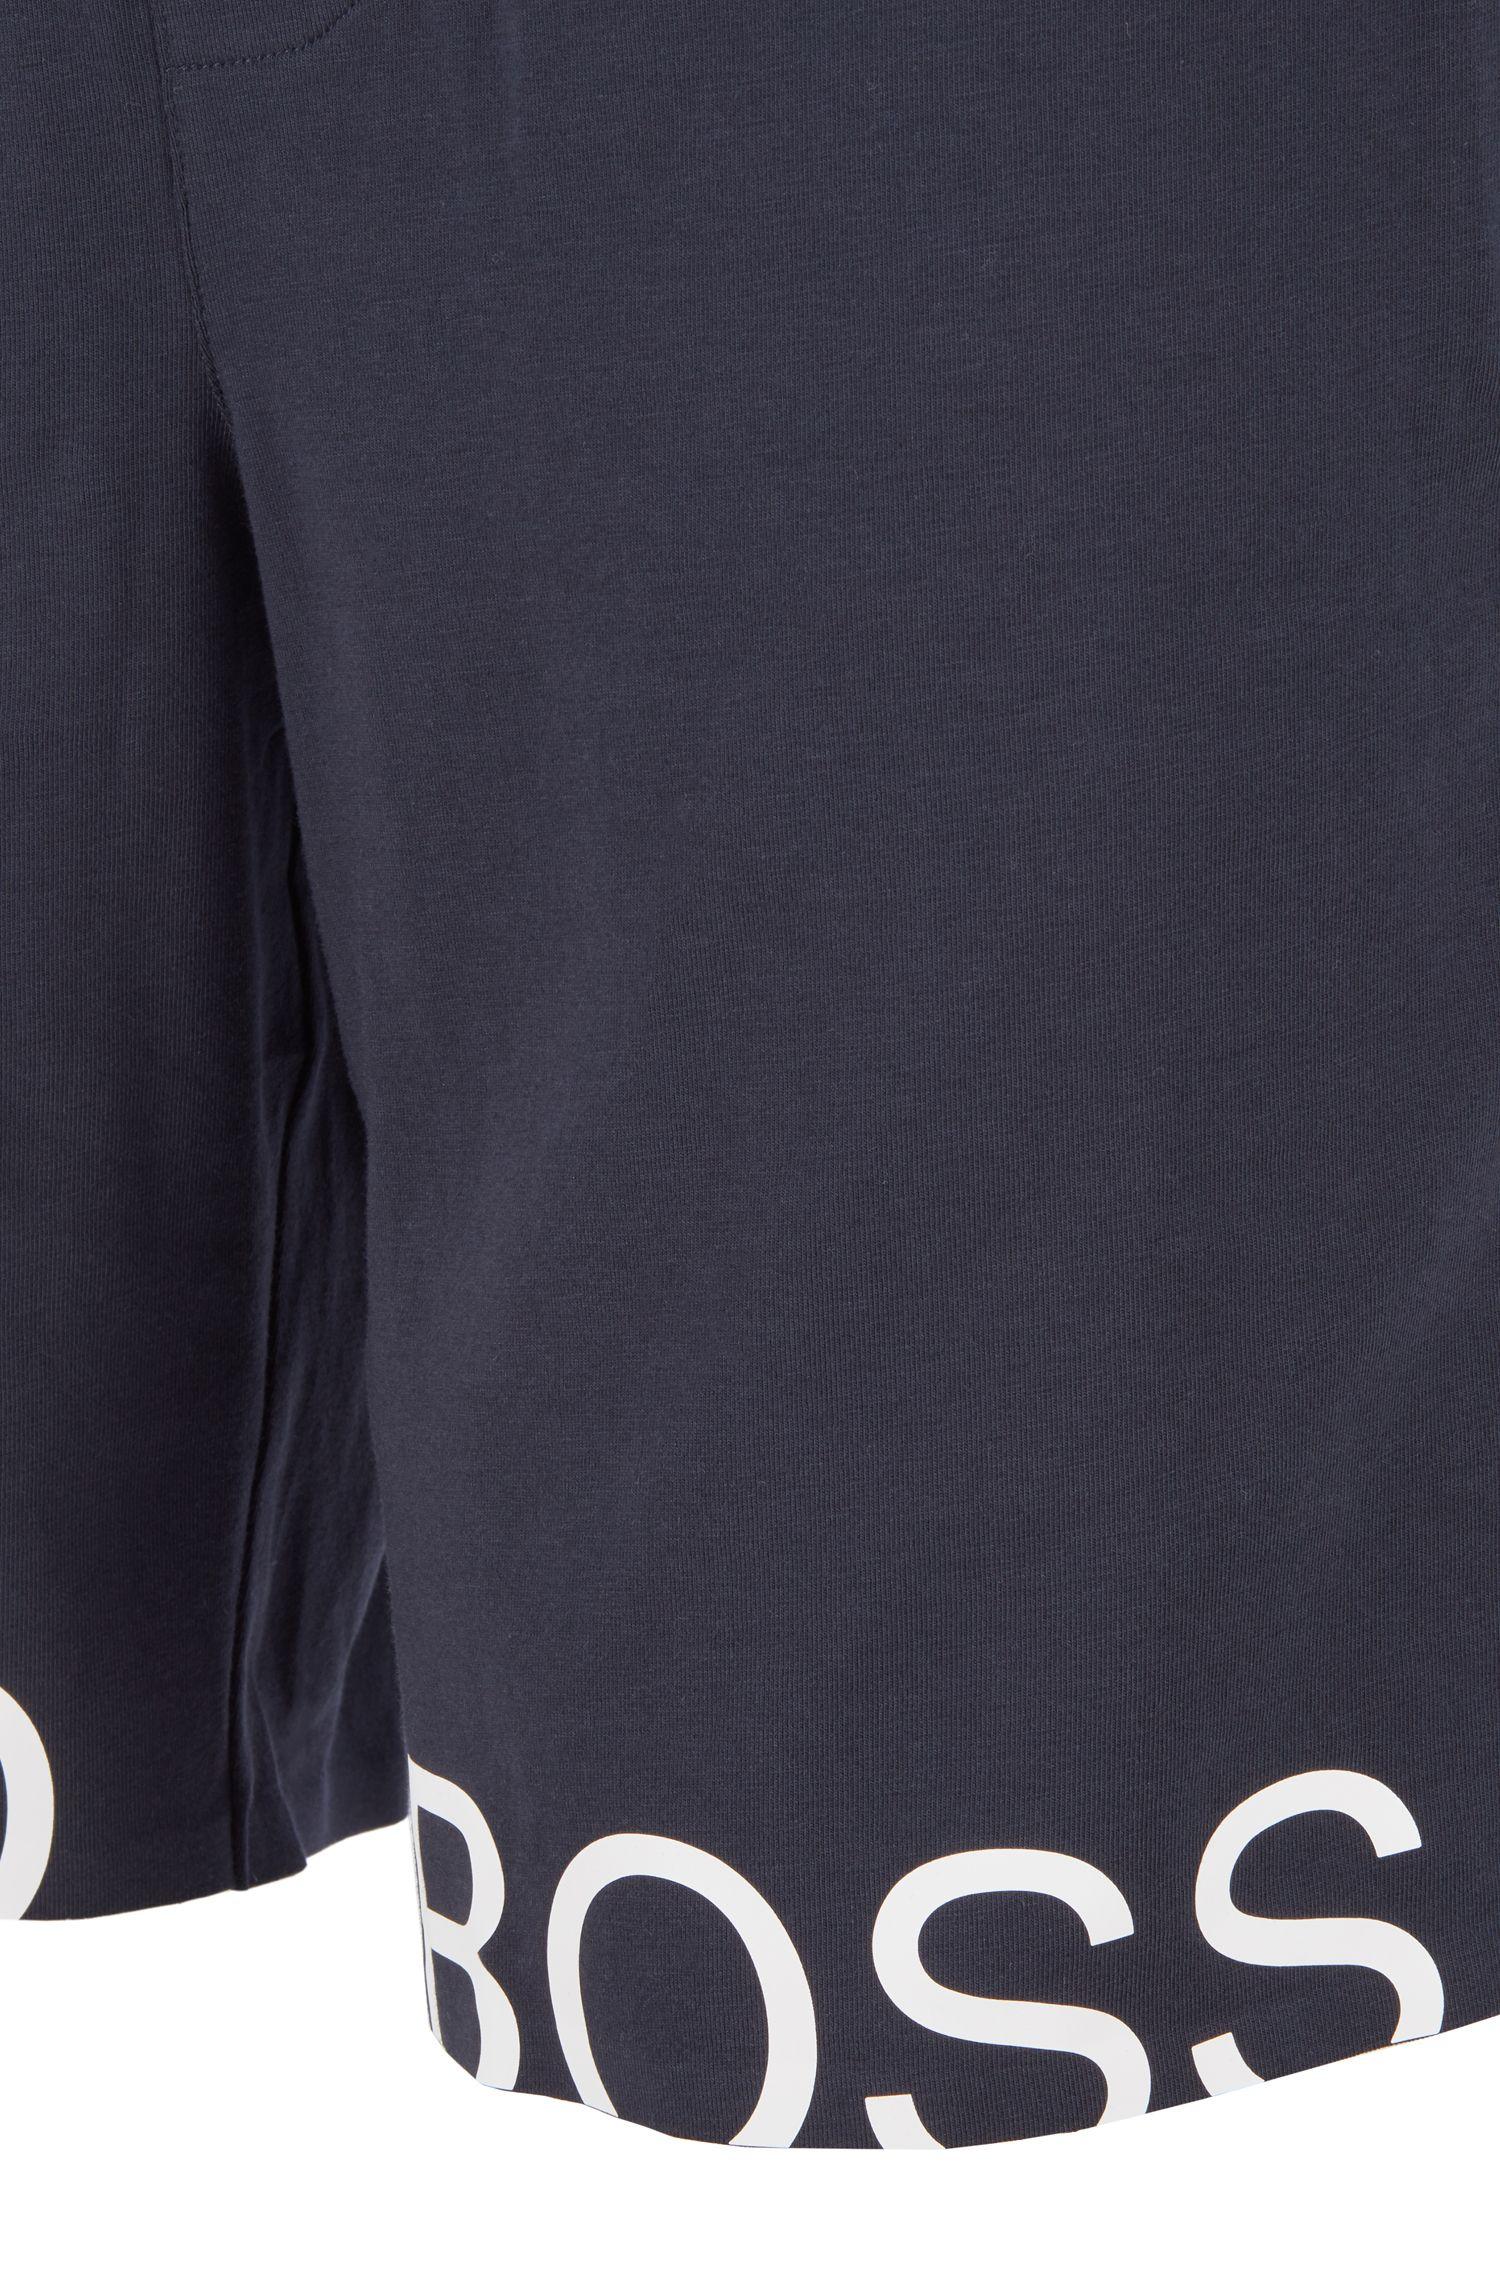 Shorts de pijama con cordón en algodón elástico con logo metálico, Azul oscuro